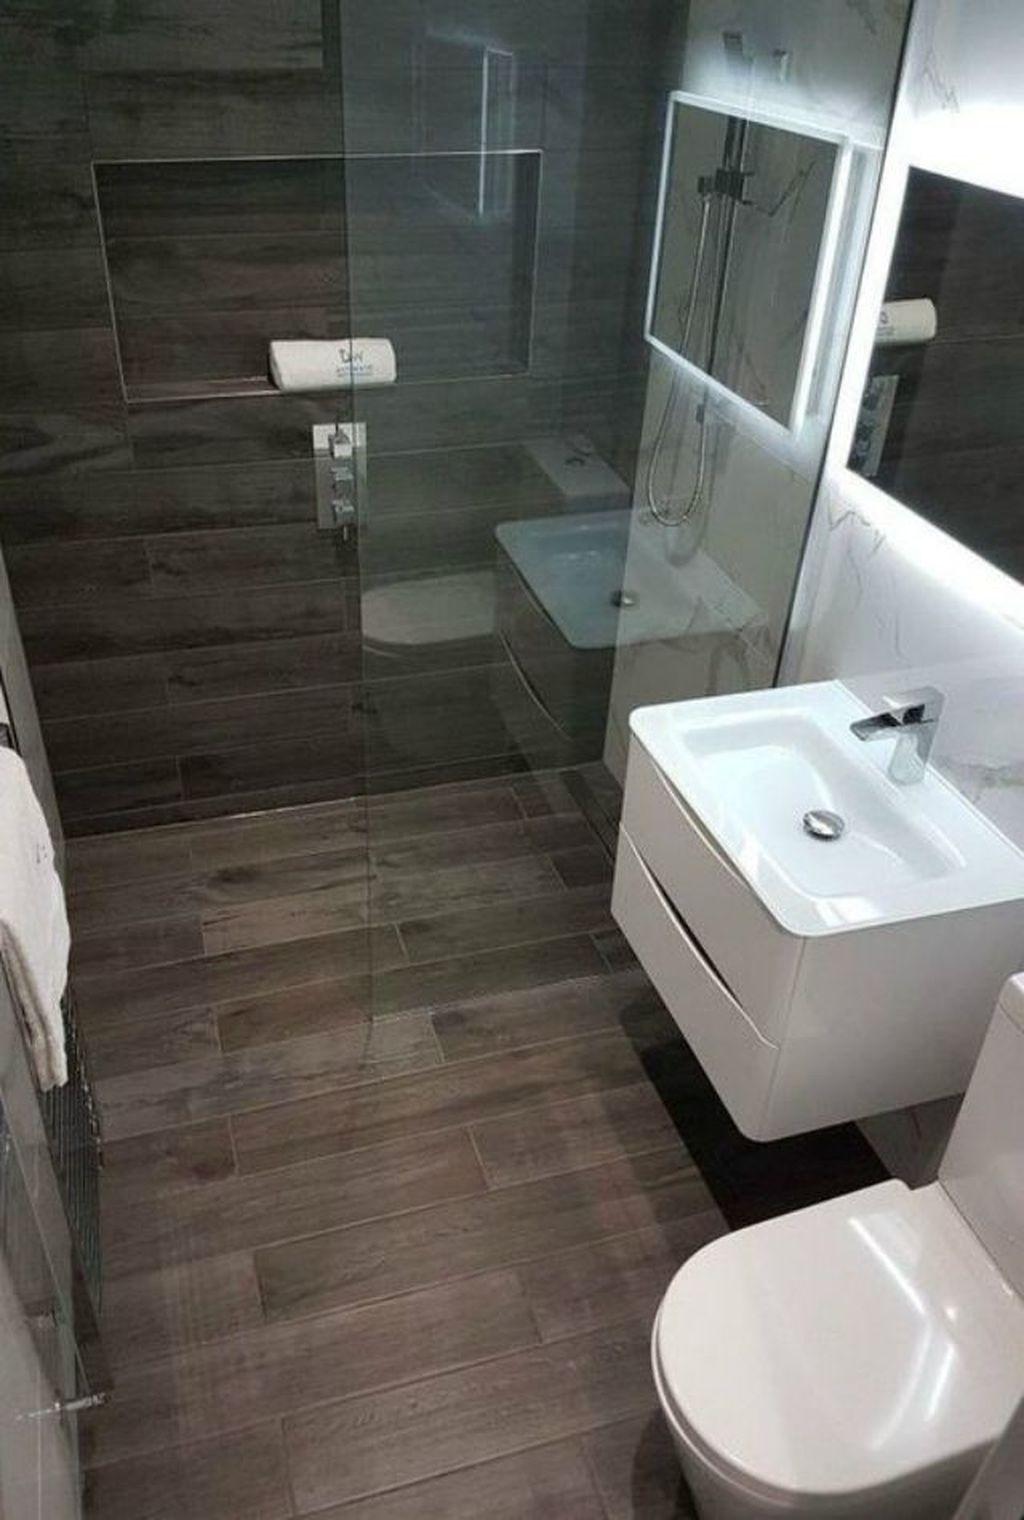 36 Nice Small Bathroom Design Ideas That You Should Copy In 2020 Modern Bathroom Design Bathroom Design Small Modern Bathroom